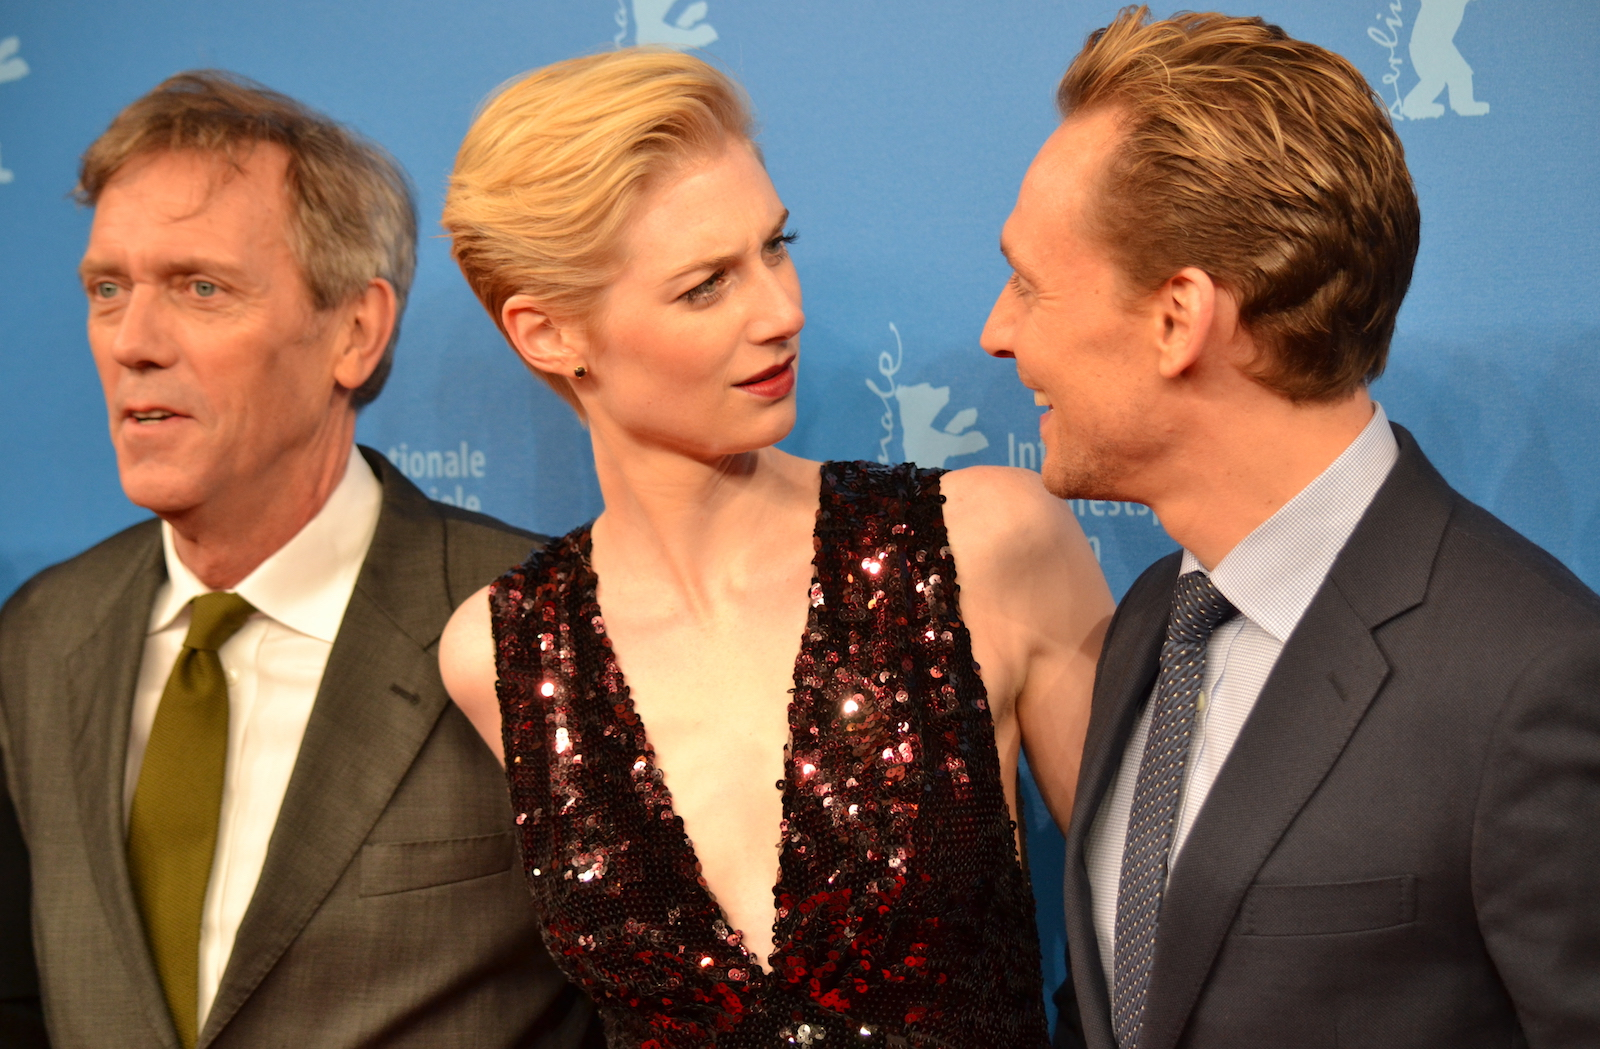 Berlino 2016: Elizabeth Debicki, Tom Hiddleston, Hugh Laurie sul red carpet di The Night Manager